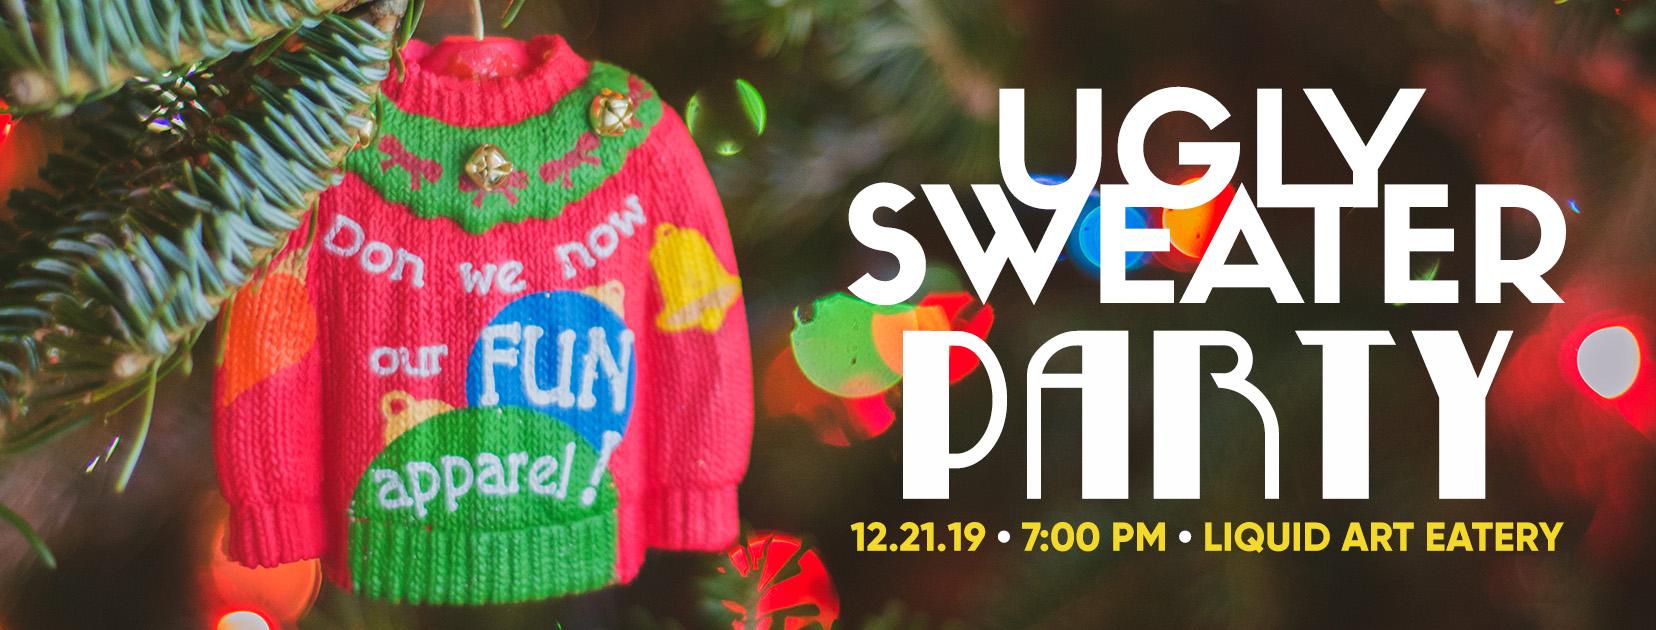 UglySweaterParty2019Slider